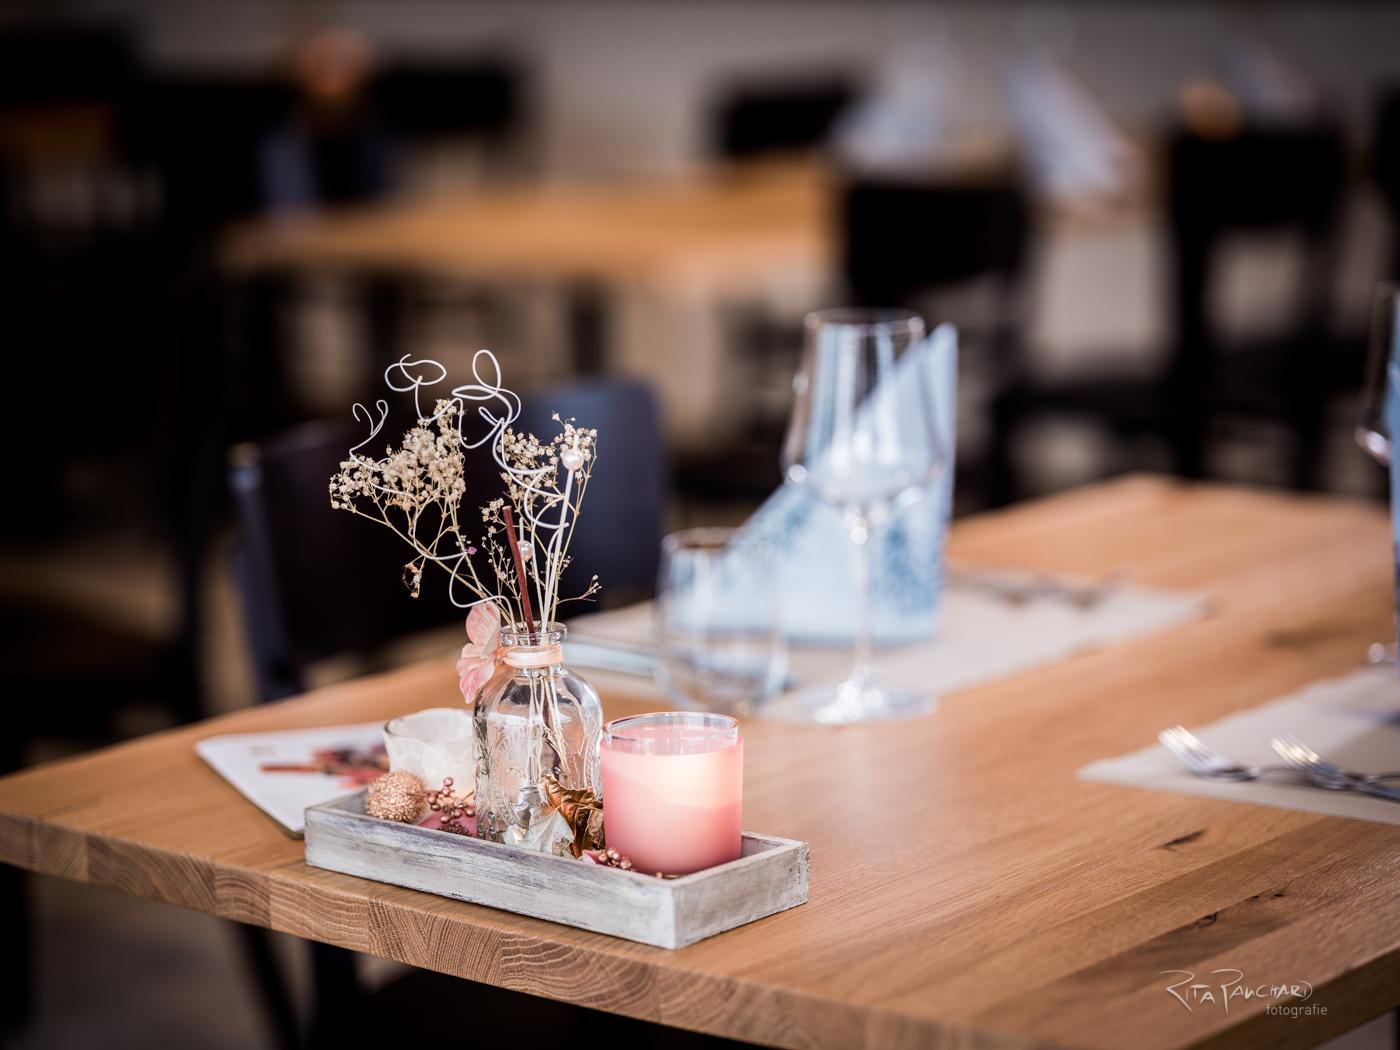 restaurantfotografie_gastrofotografie-5041.jpg